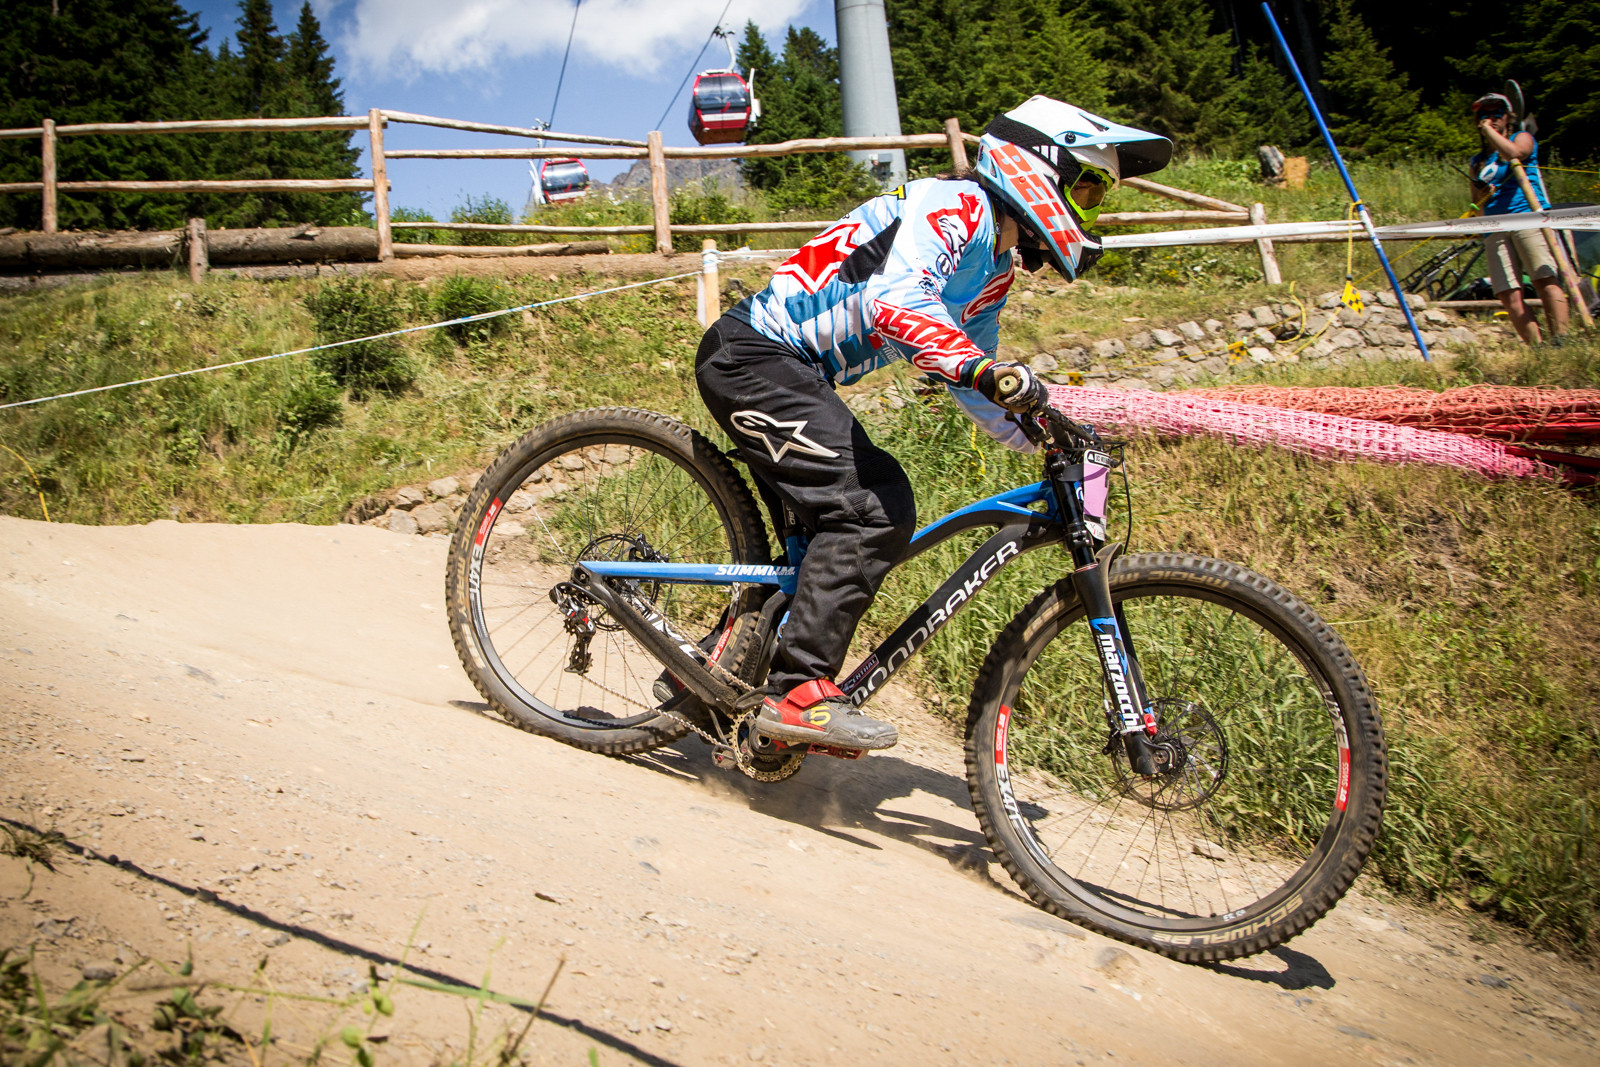 Emmeline Ragot, G-Out Project, Lenzerheide World Cup - G-Out Project - Lenzerheide World Cup - Mountain Biking Pictures - Vital MTB